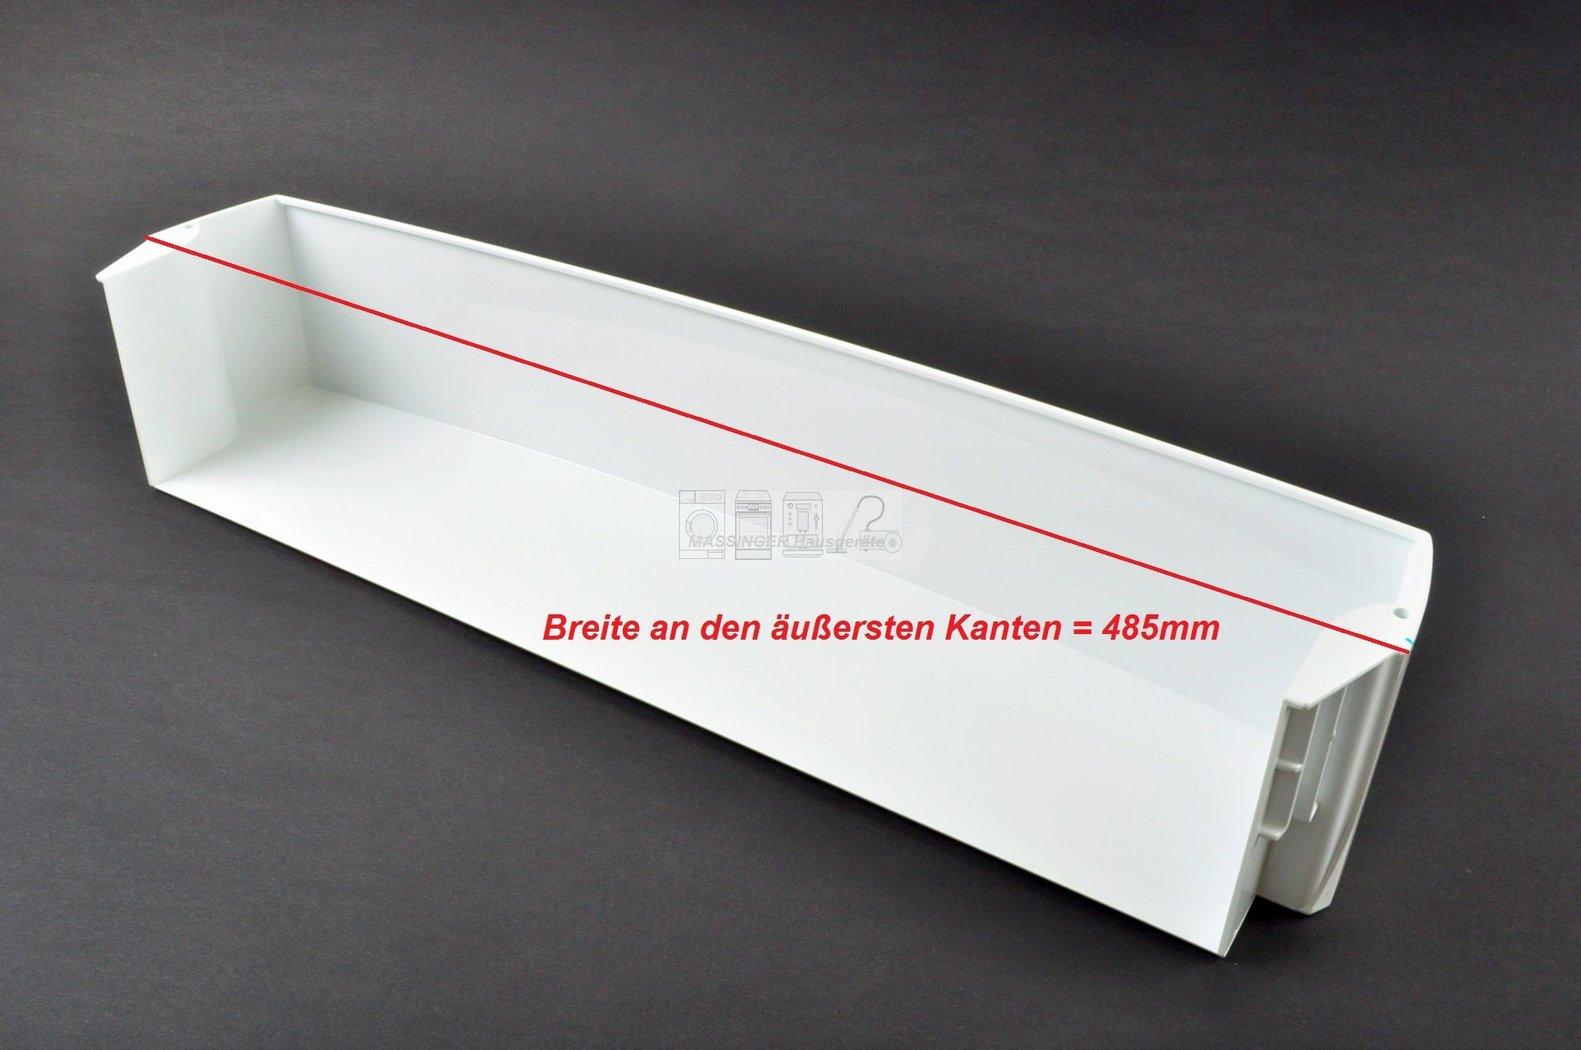 Bomann Kühlschrank Ersatzteile : Kühlschrank camping 4230 electrolux rm jennifer h. juarez blog